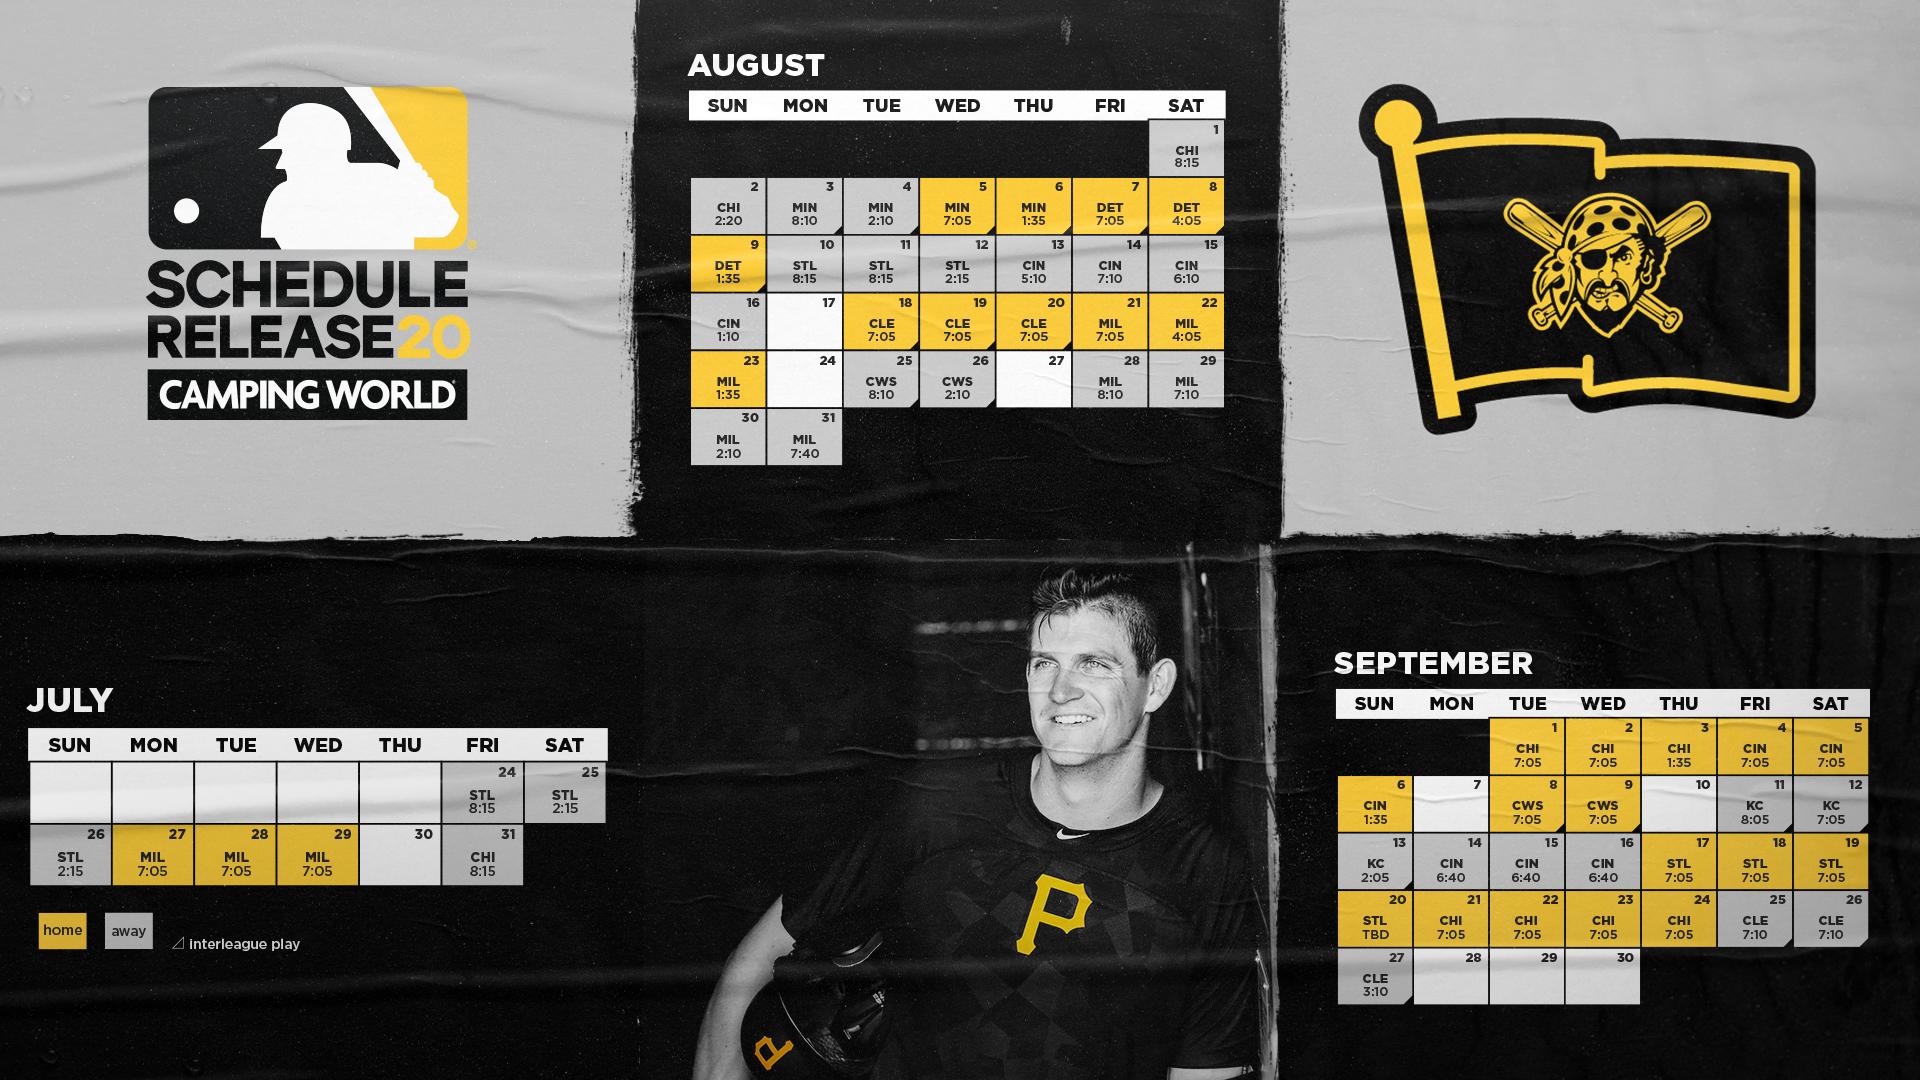 Pirates 2020 schedule